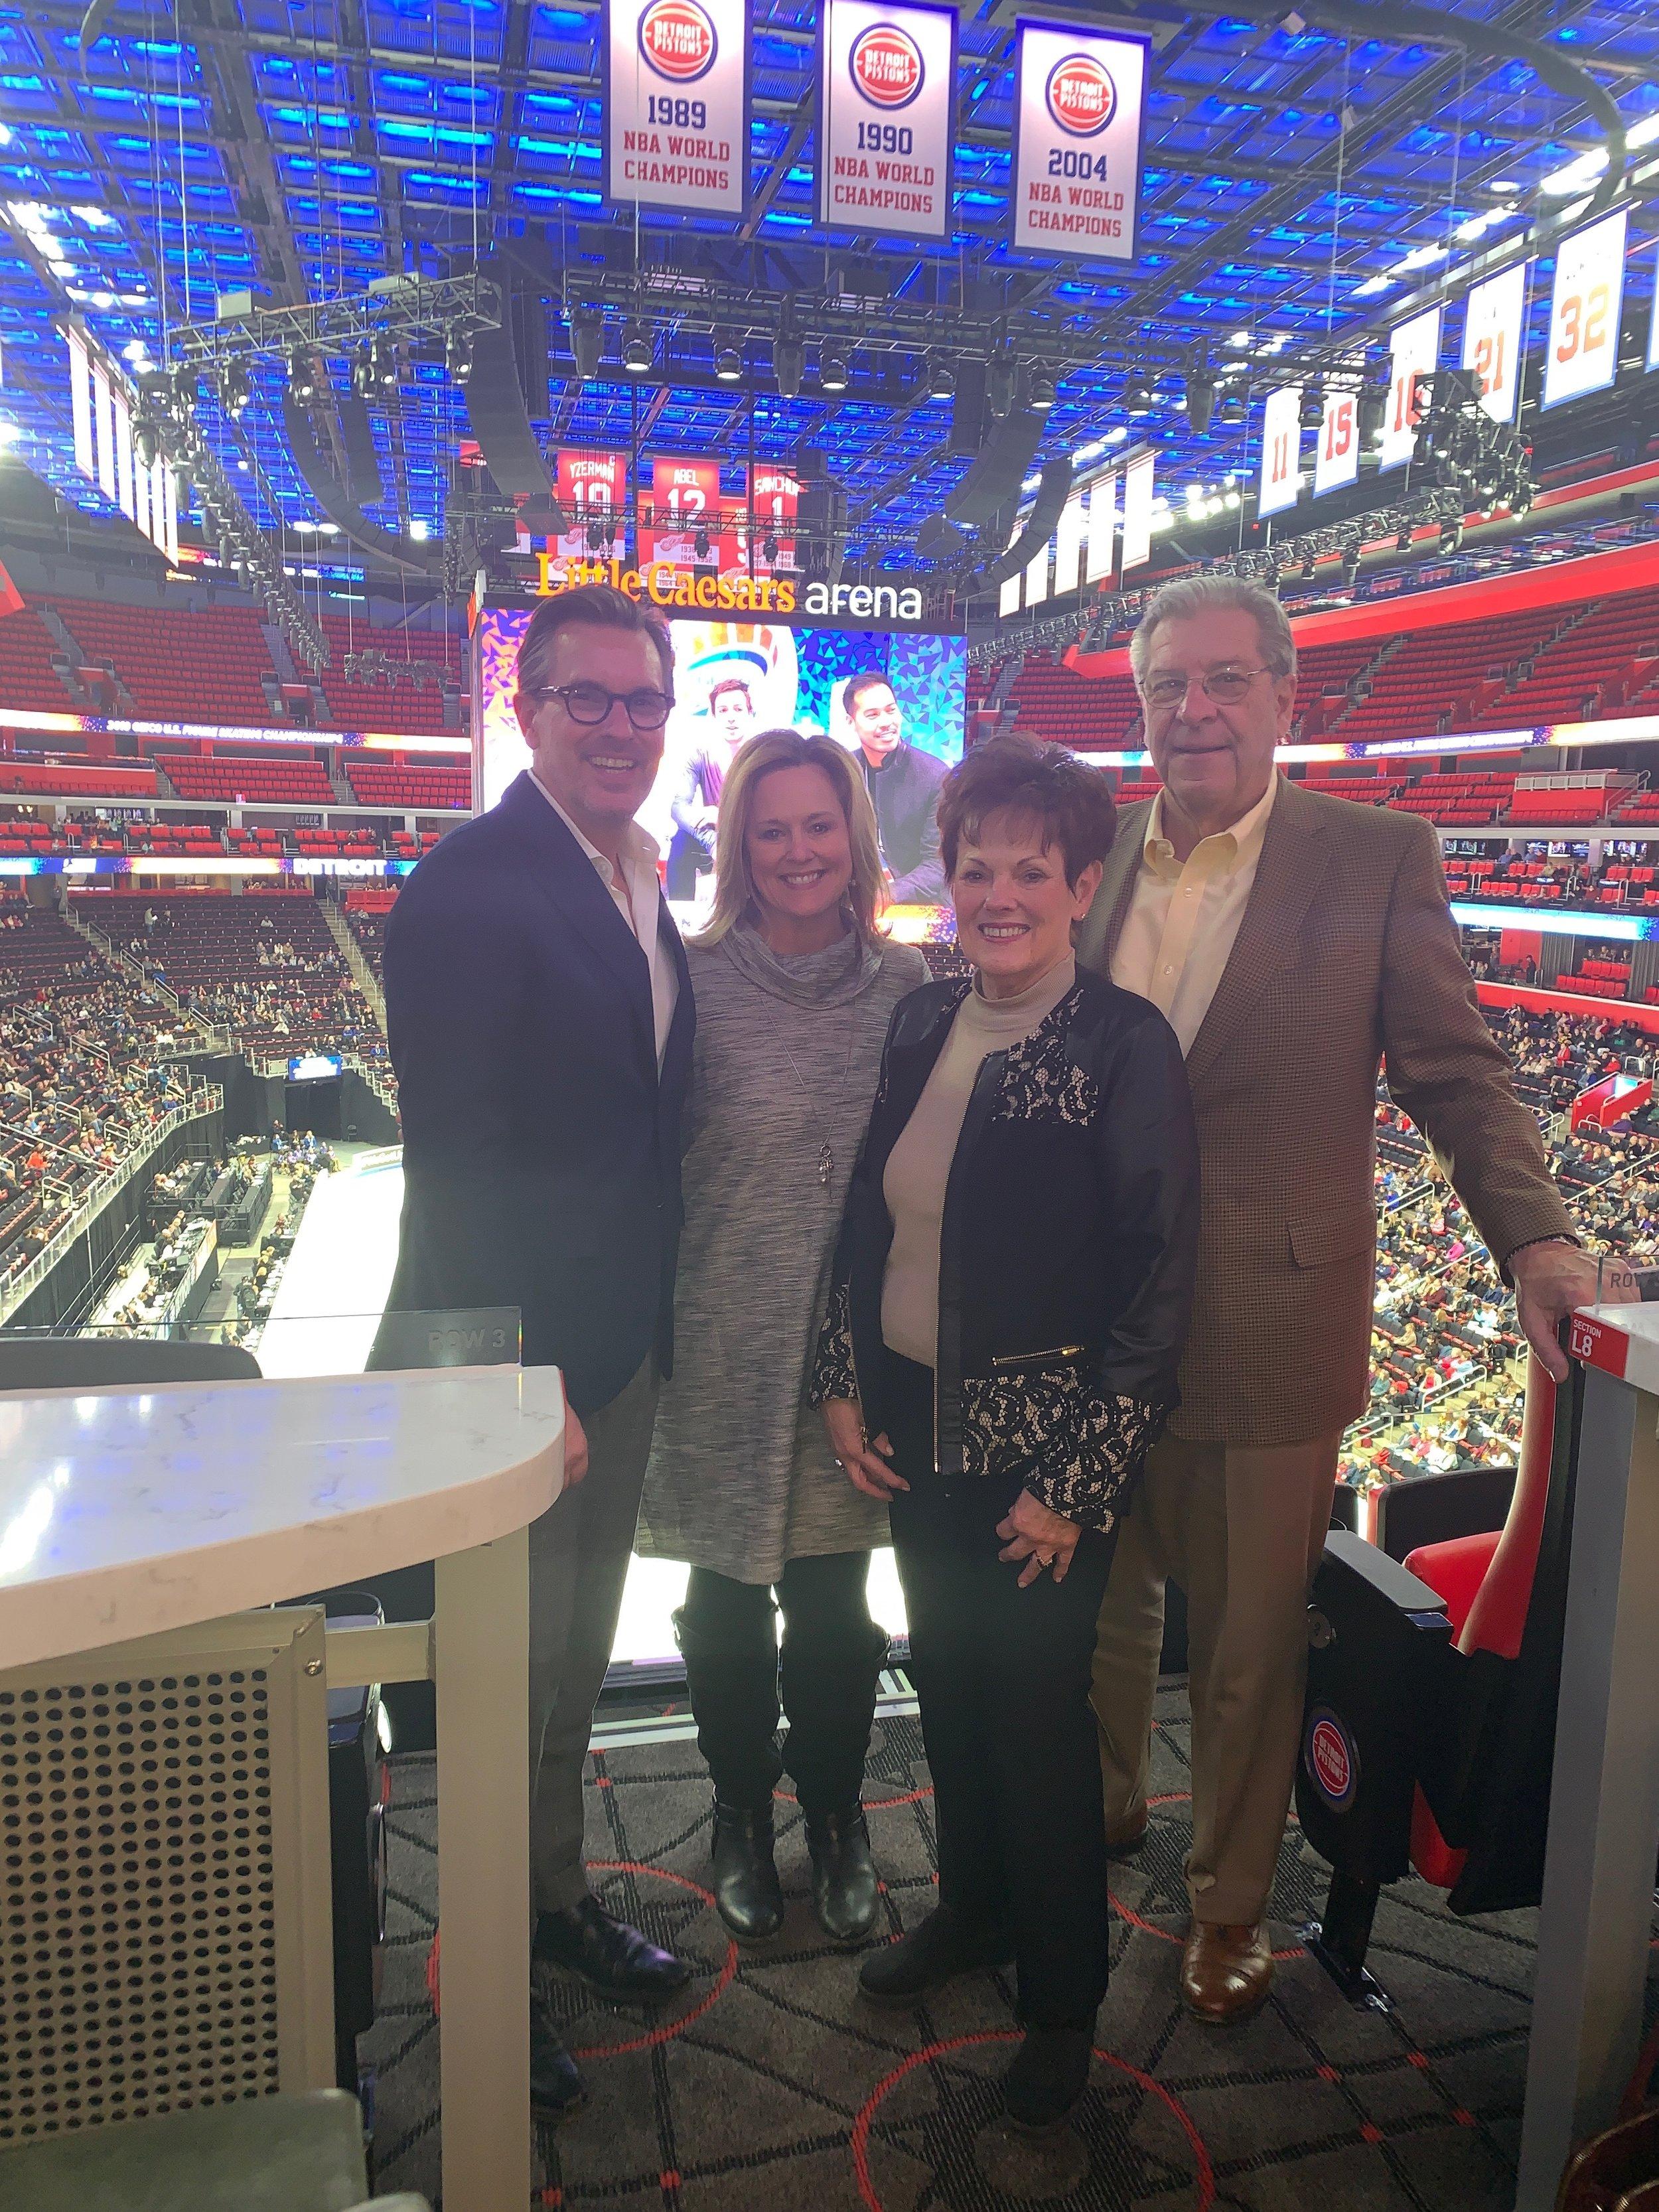 Marc Lagrois, Michelle Lagrois Carey, Glenda Lagrois and Bill Frohreip at Little Caesar's Arena